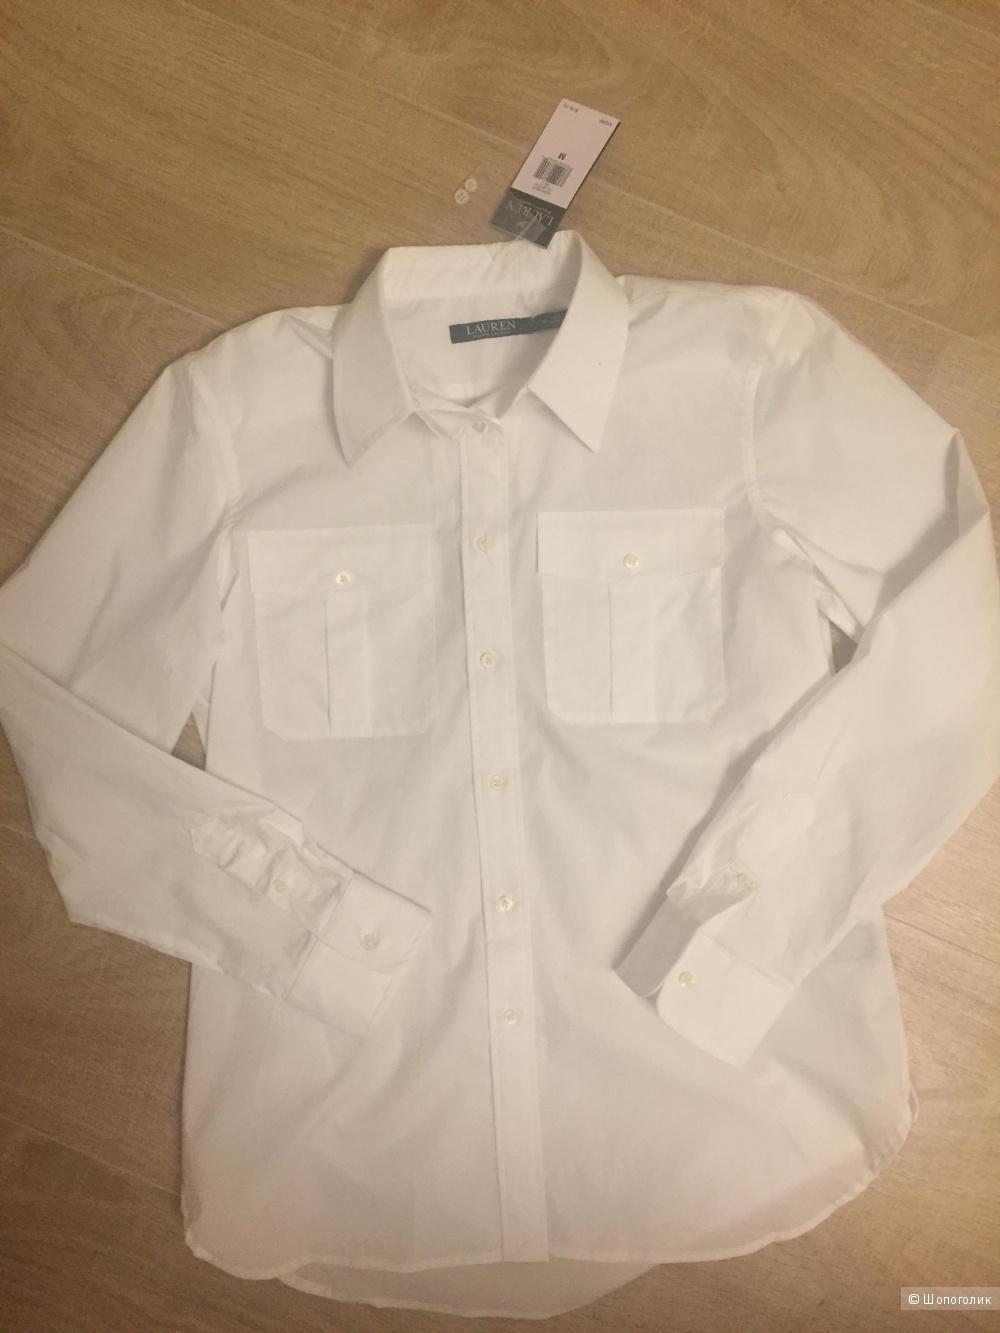 Хлопковая новая рубашка Ralph Louren размер M ( L )